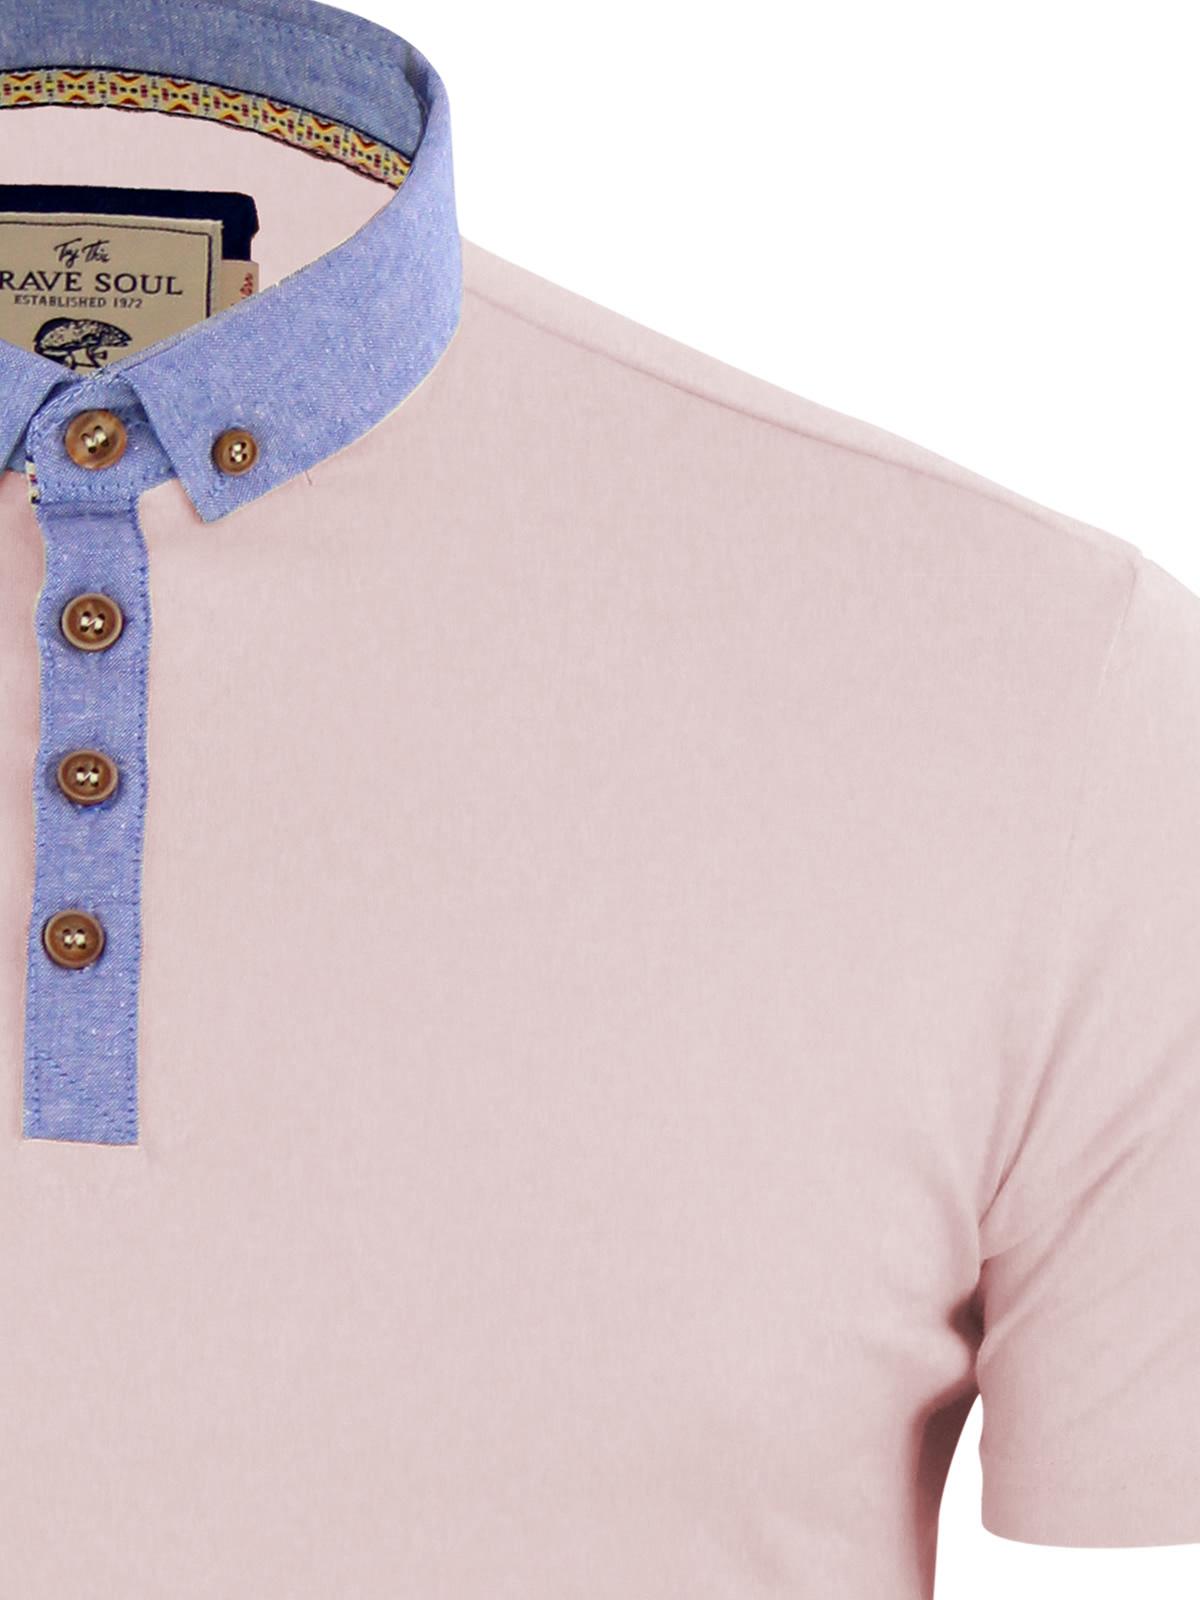 Mens-Polo-T-Shirt-Brave-Soul-Chimera-Chambray-Collared-Cotton-Casual-Top thumbnail 31